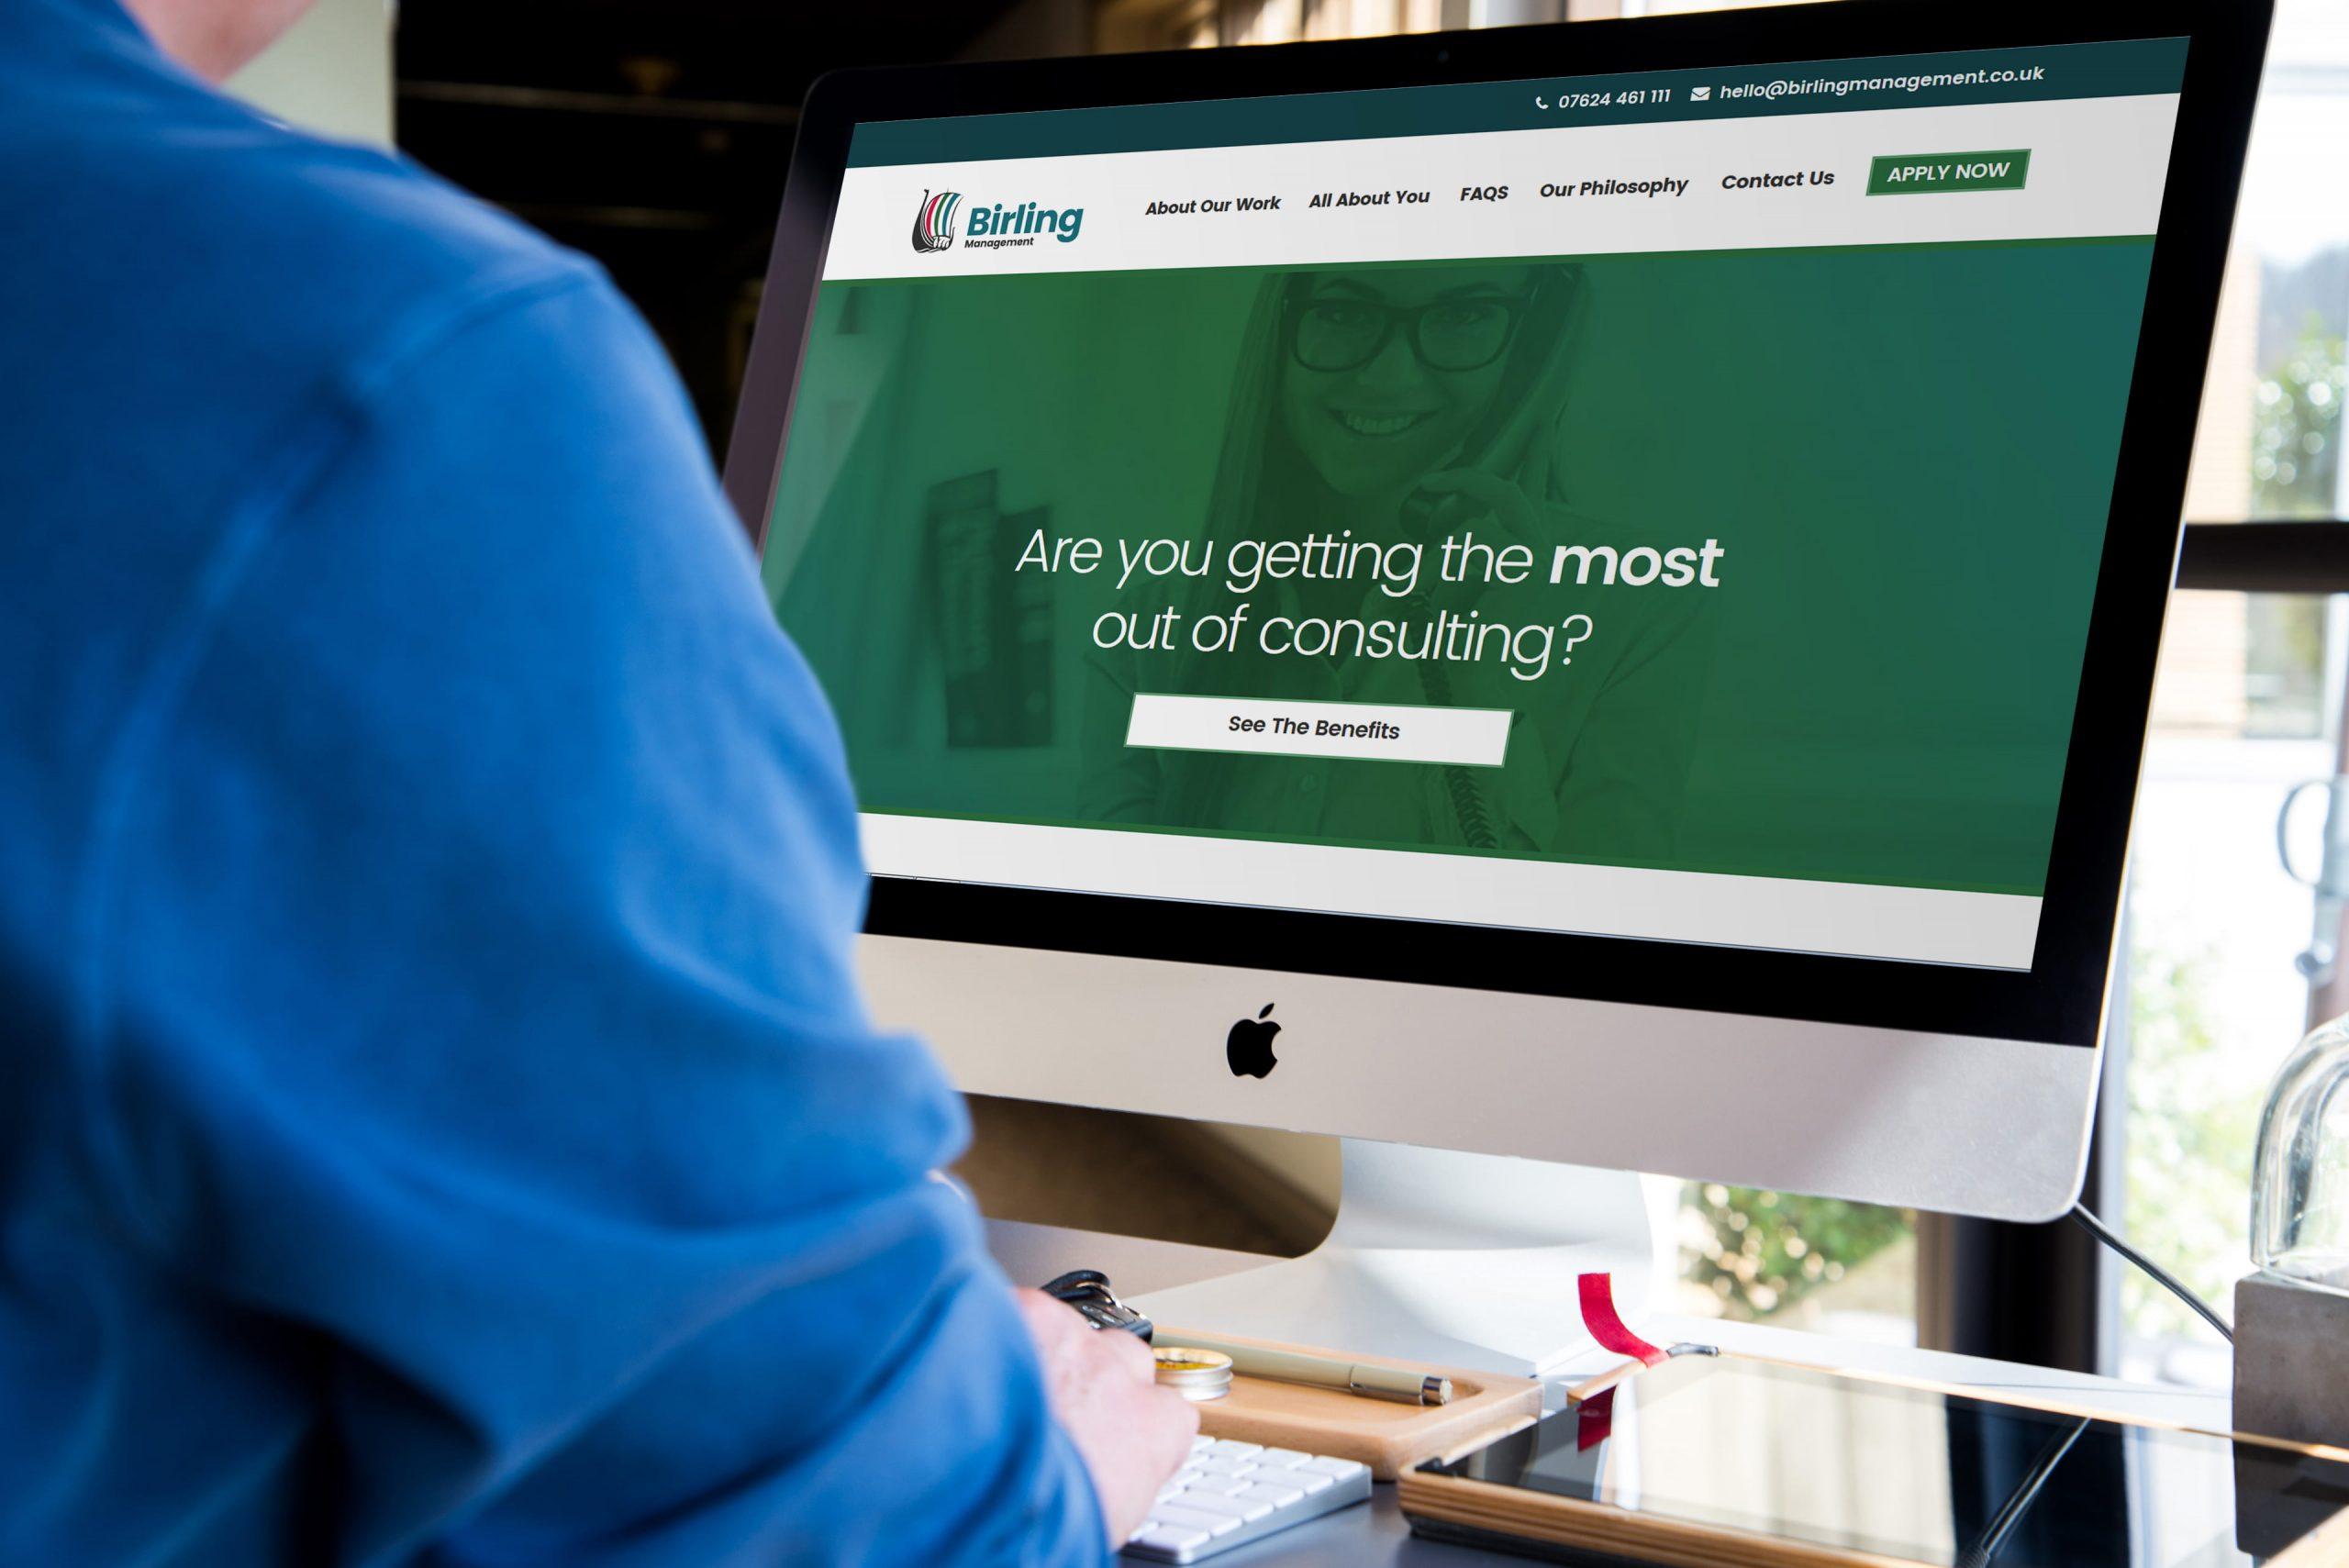 Birling Management website being viewed by person on Mac desktop computer